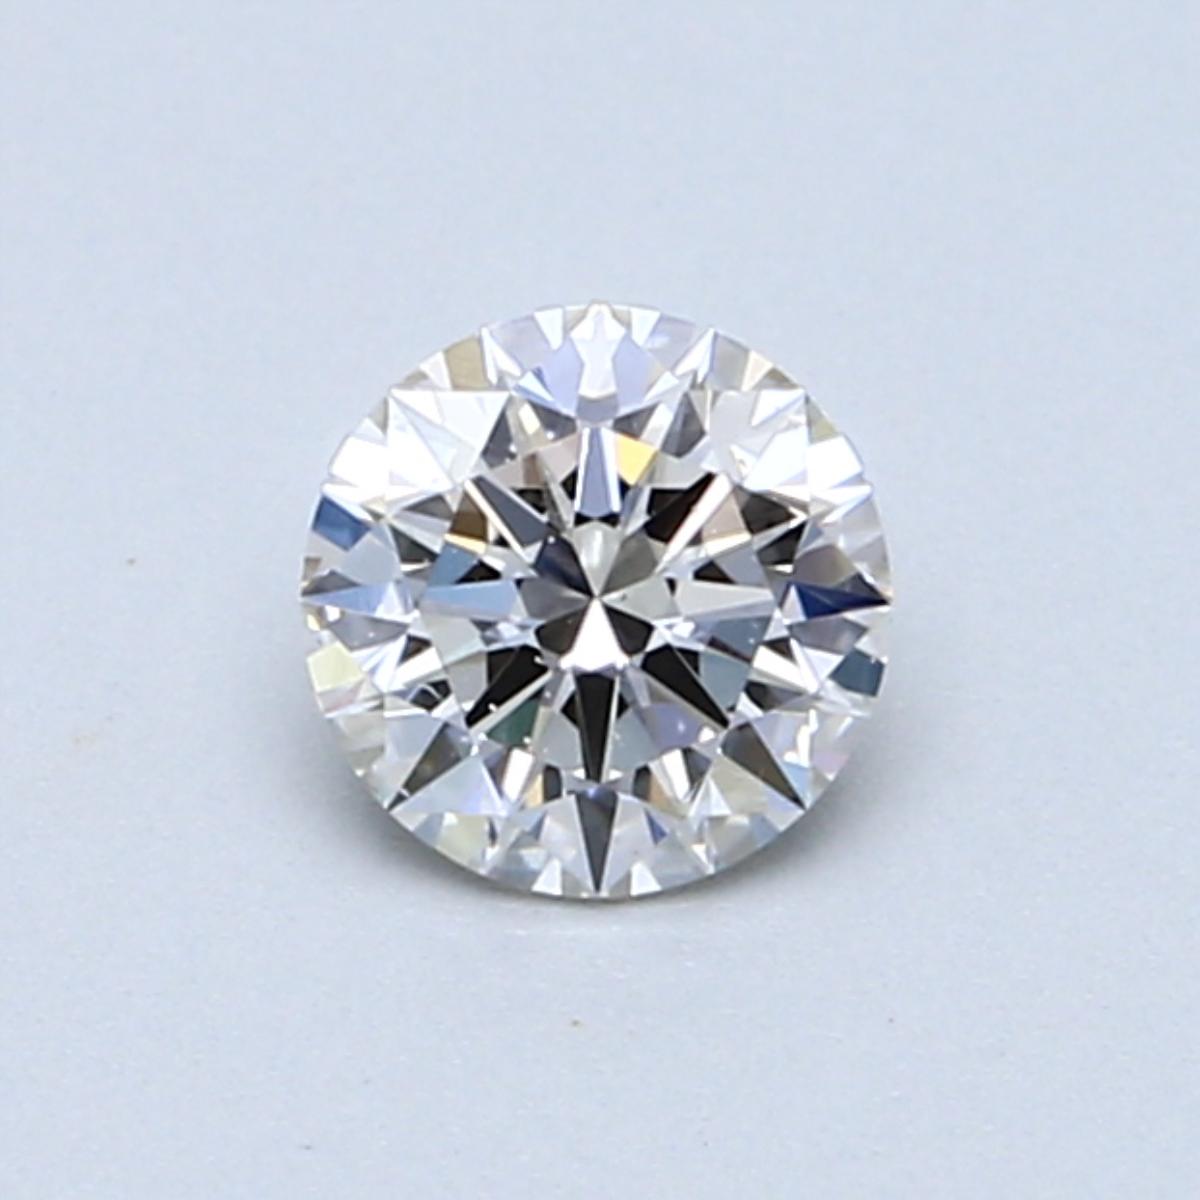 0.52 Carat I SI1 Round Diamond